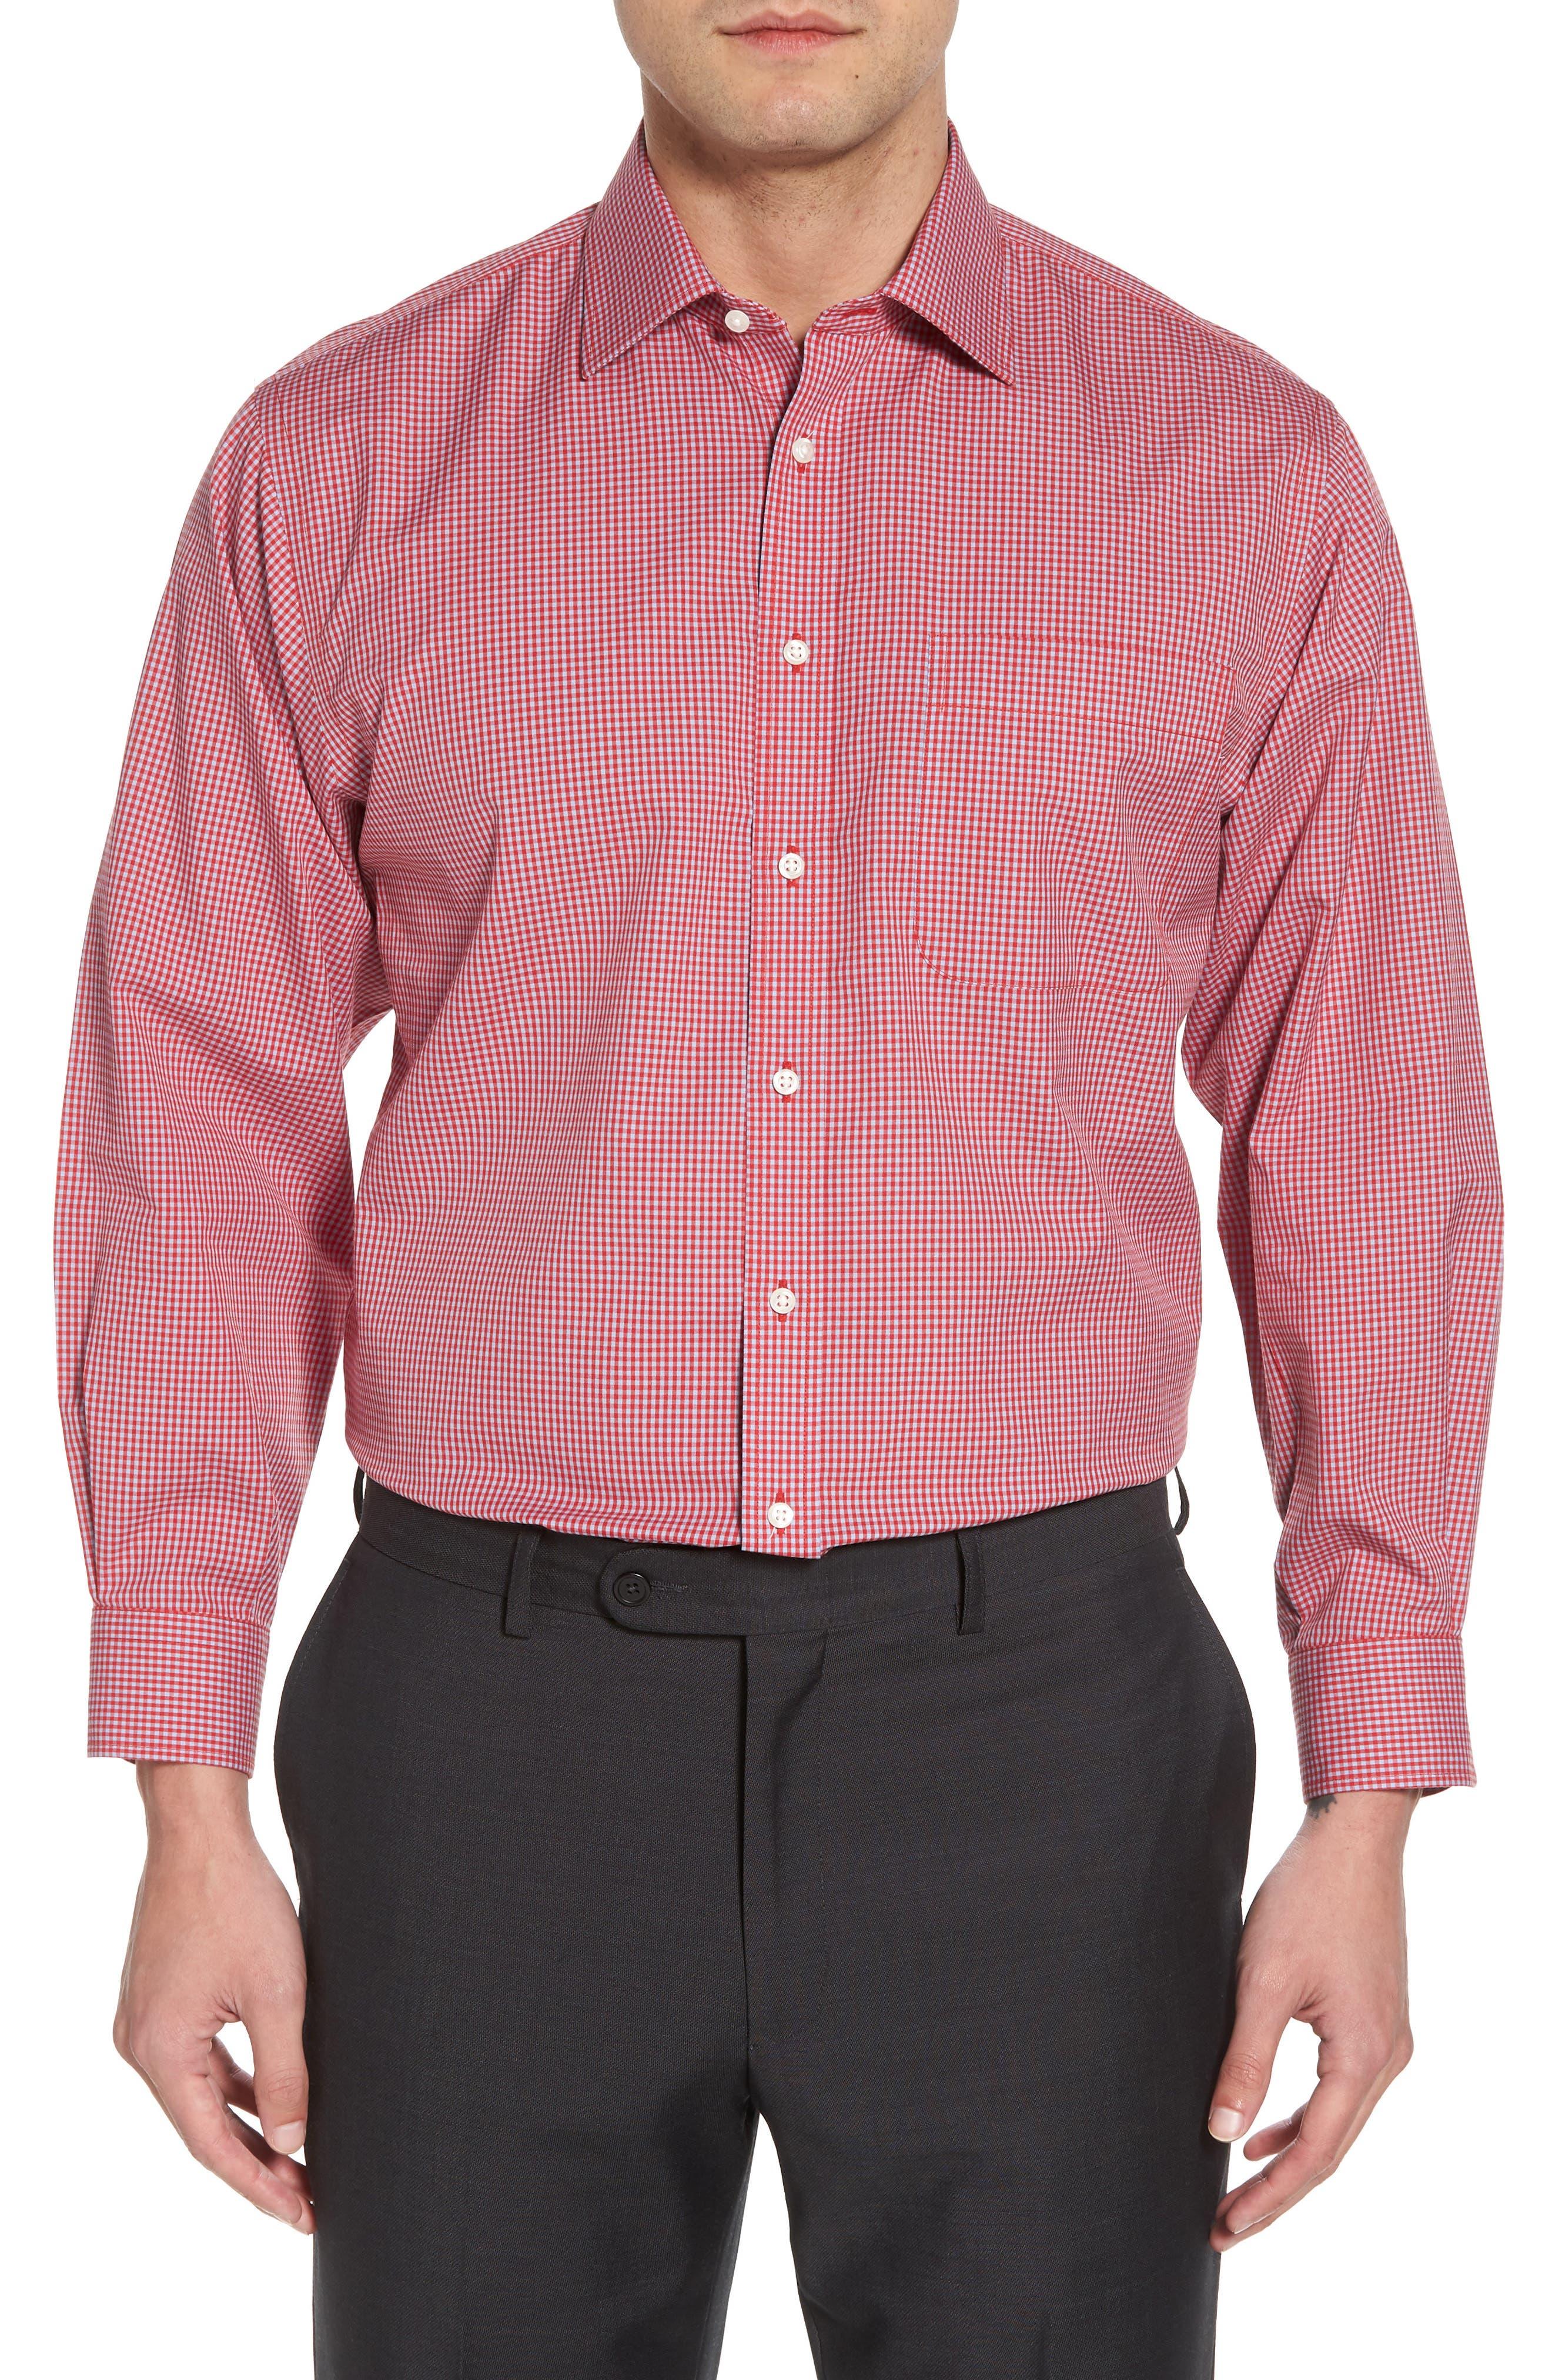 Smartcare Classic Fit Check Dress Shirt,                         Main,                         color, Red Barbados